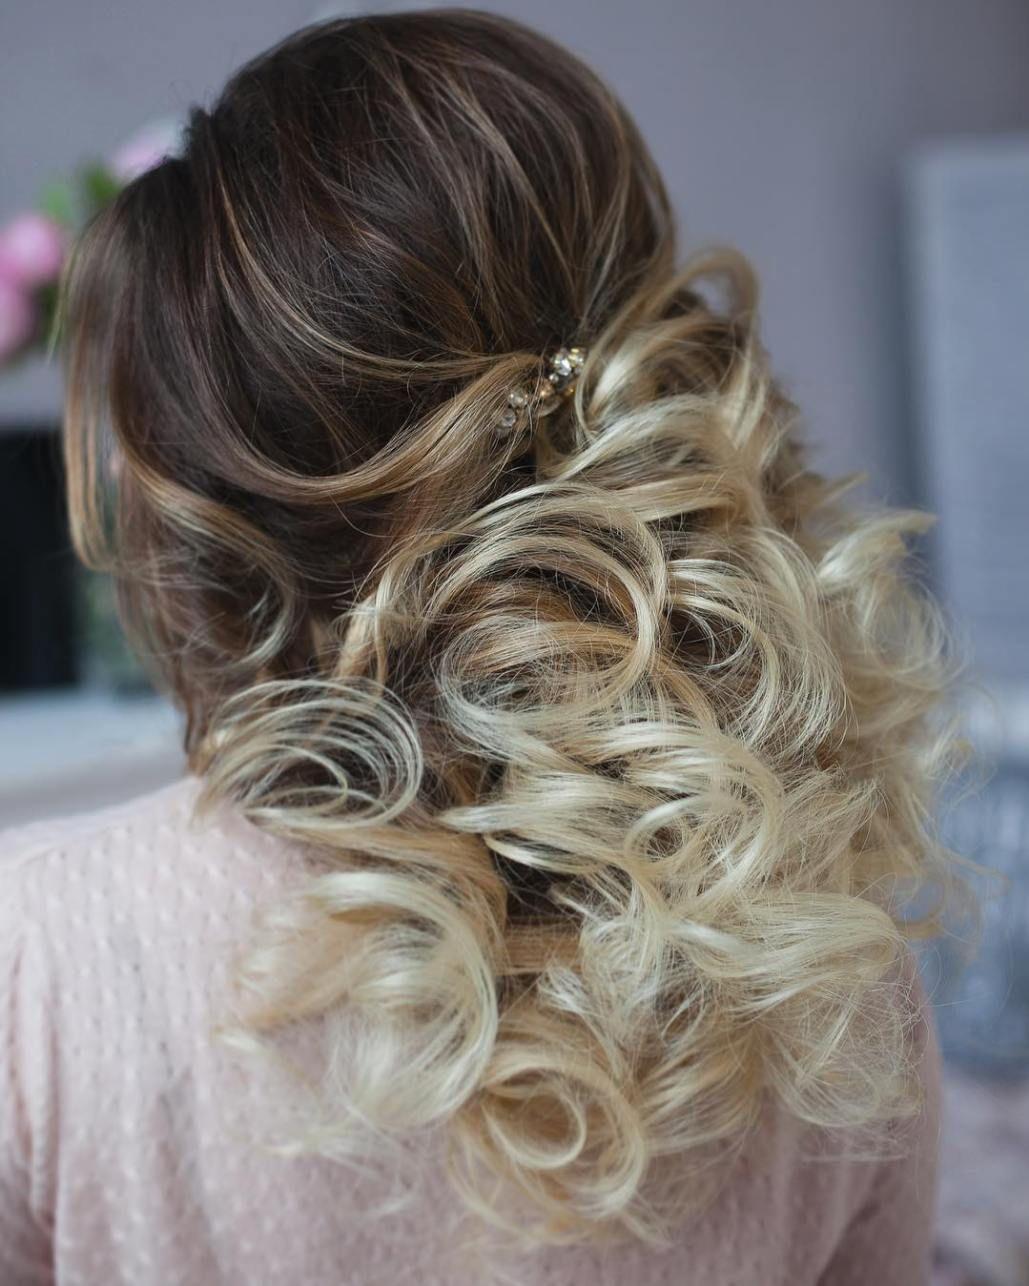 half up half down wedding hairstyles – 50 stylish ideas for